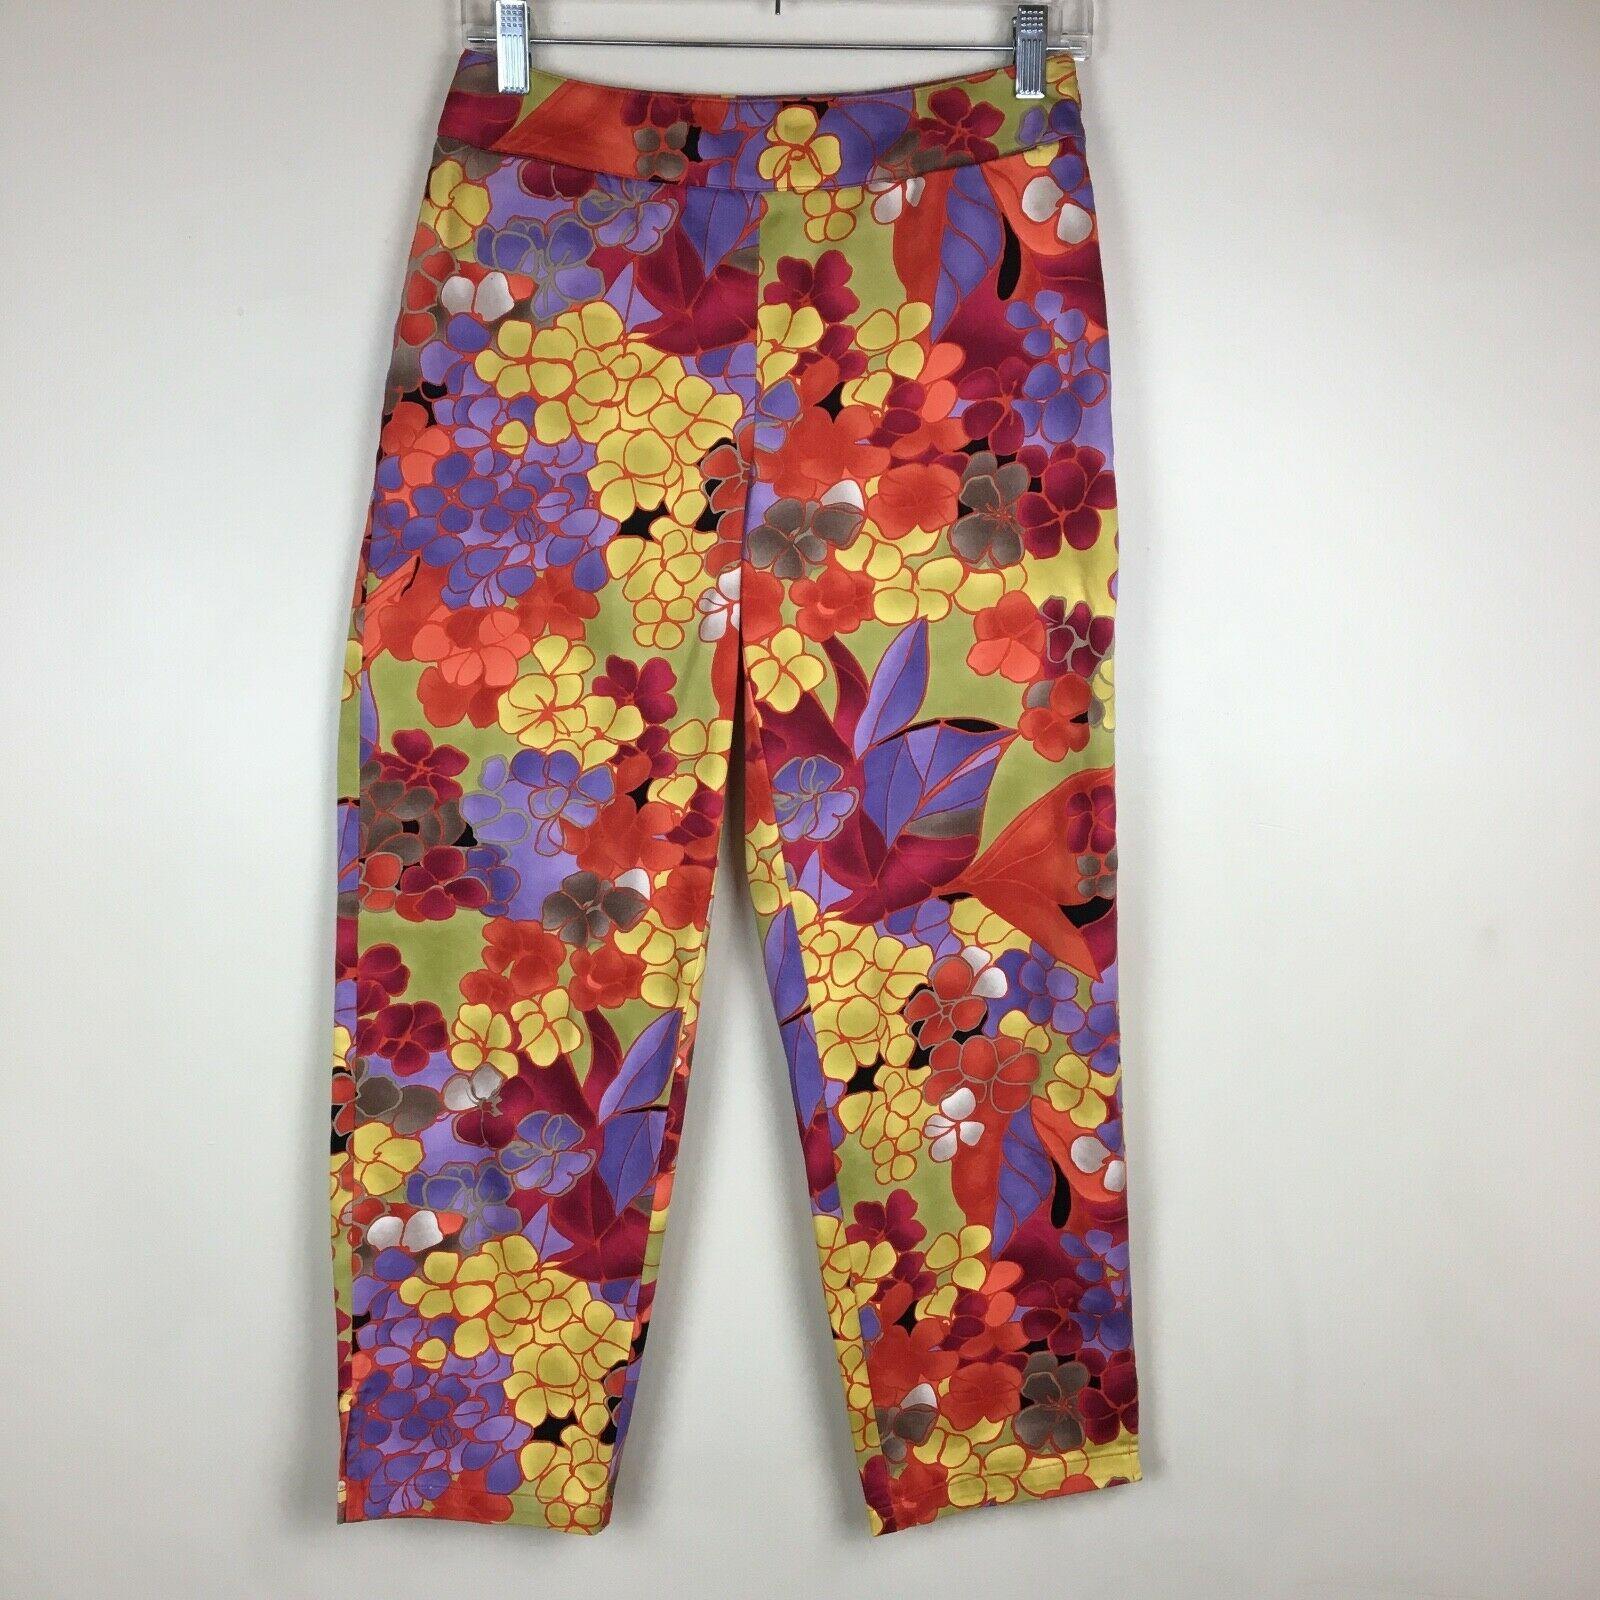 Talbots Petites Stretch Bright Colorful Capri Cropped Pants Slimming Petite 4 - $19.79